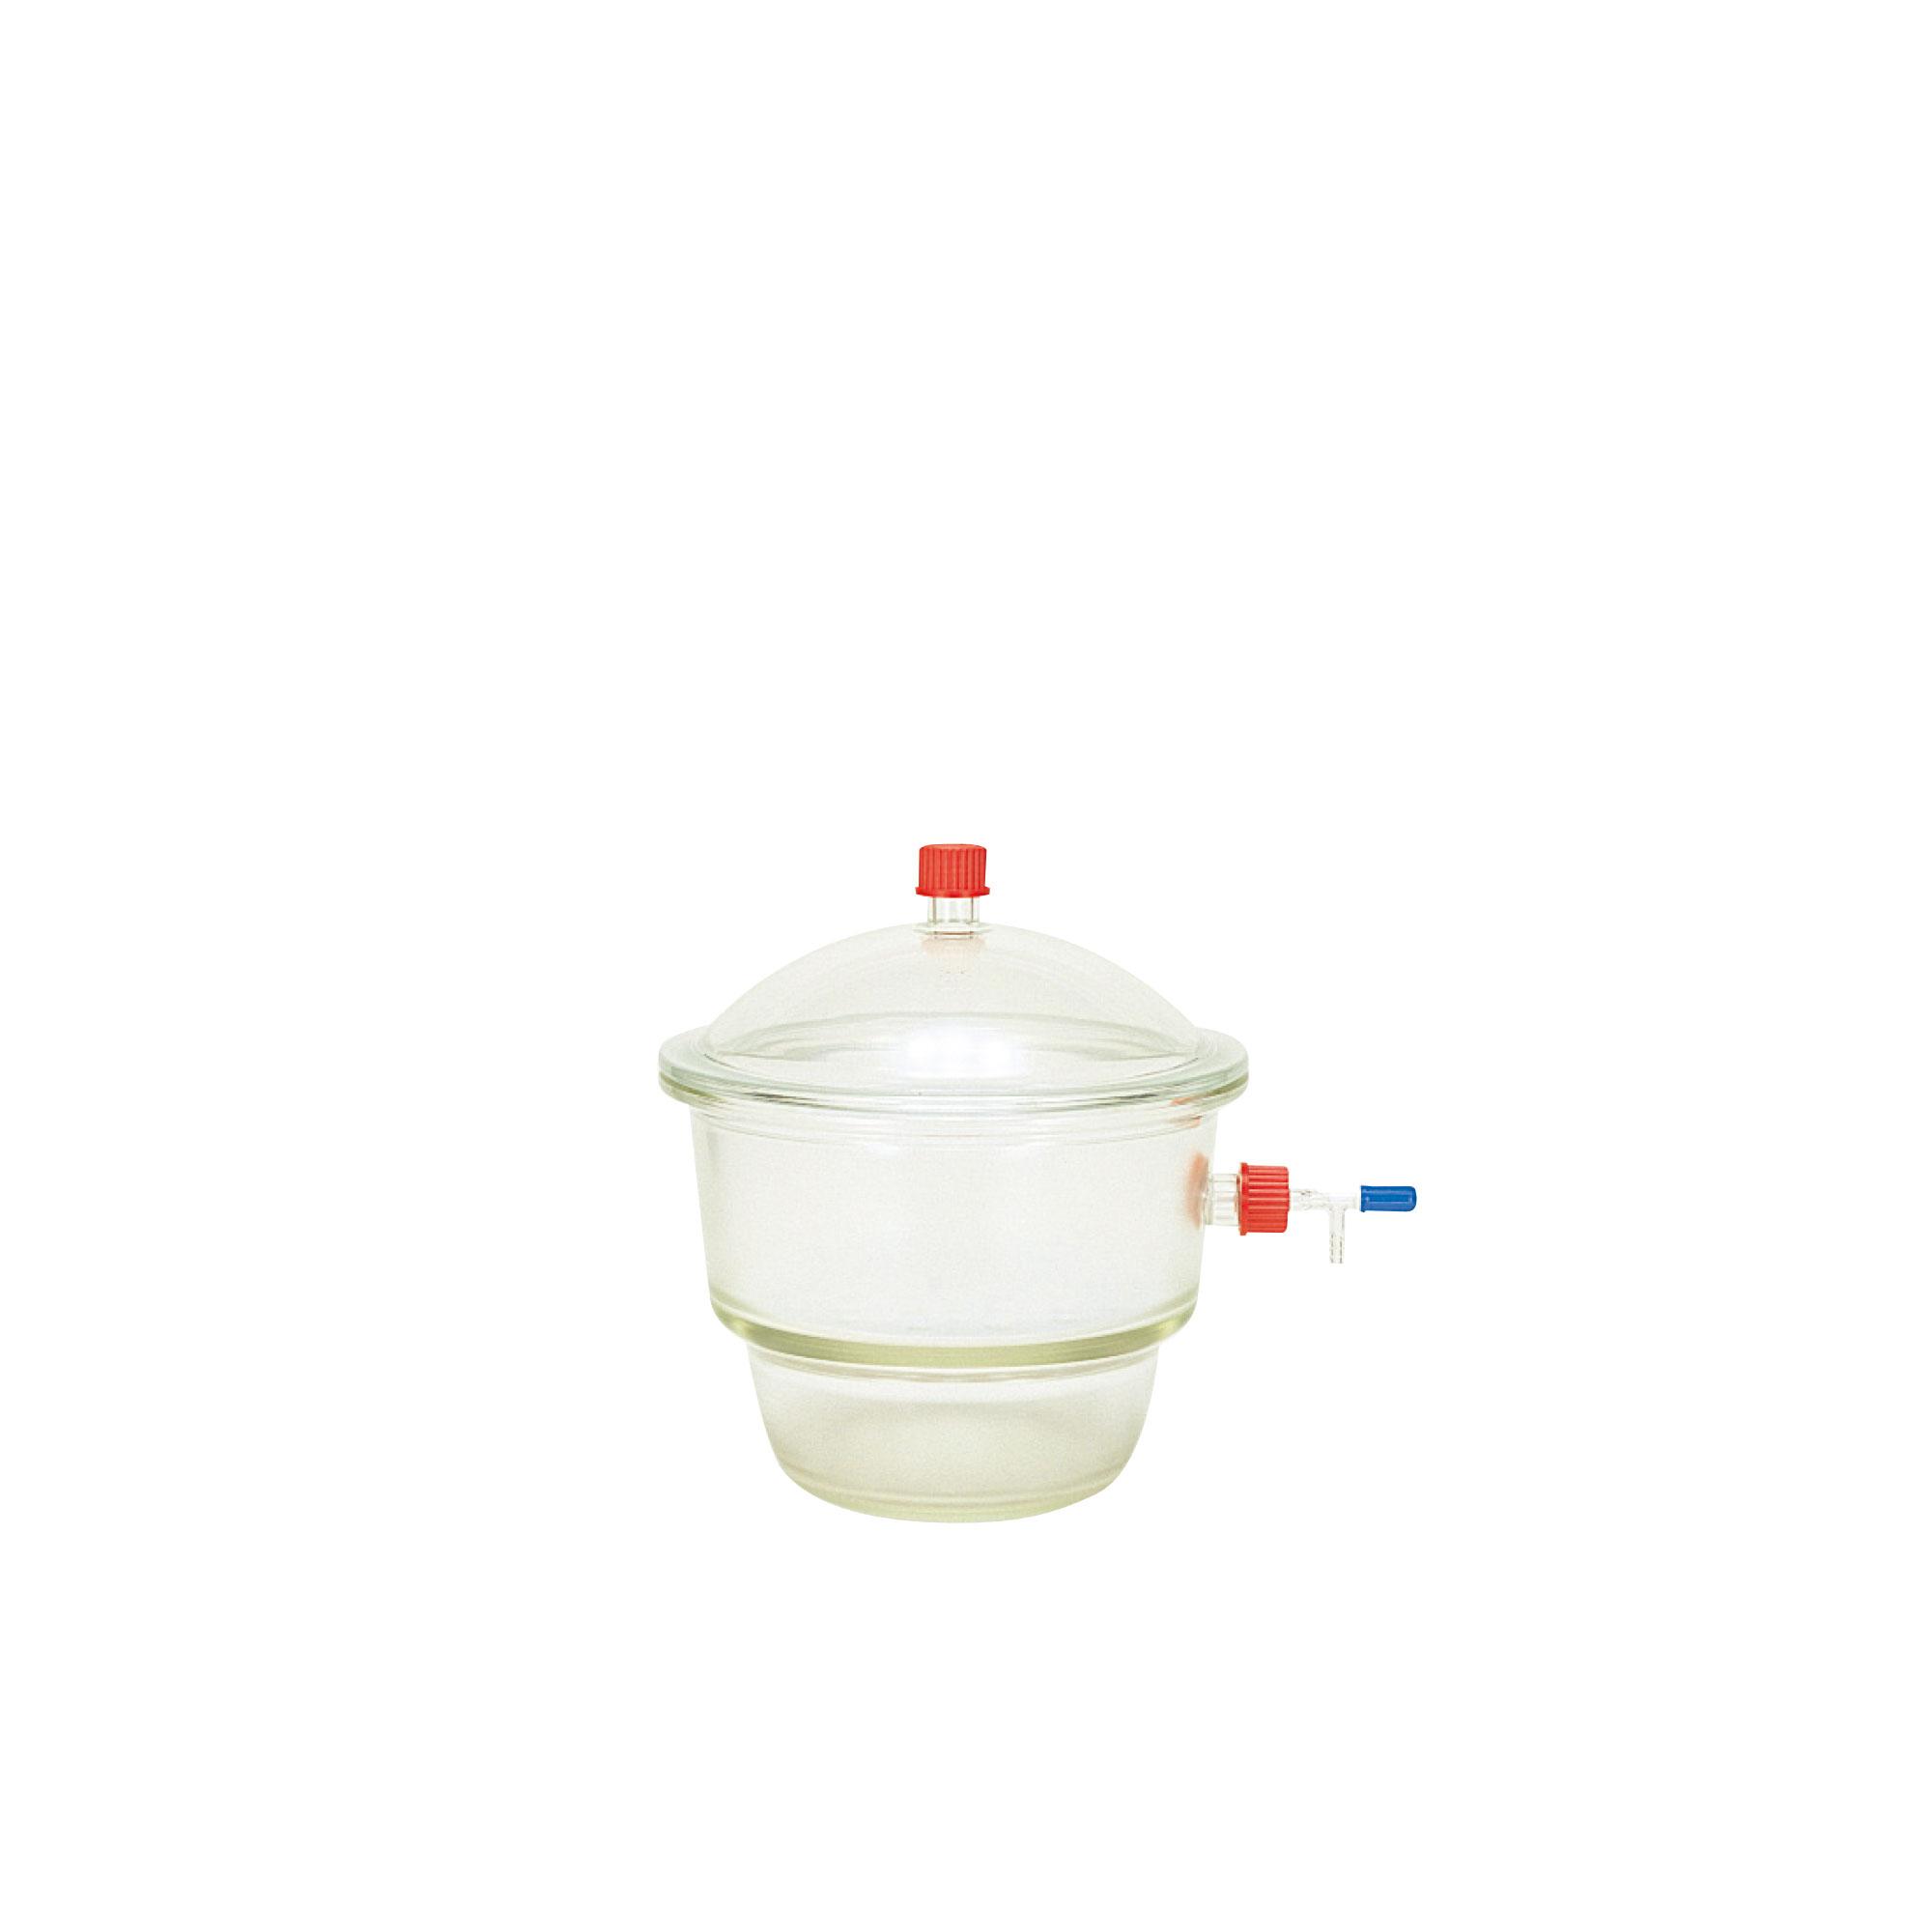 DURAN ねじ口デシケーター 横口 コック付 中板 プラスチックキャップ付 GL-32 No.150